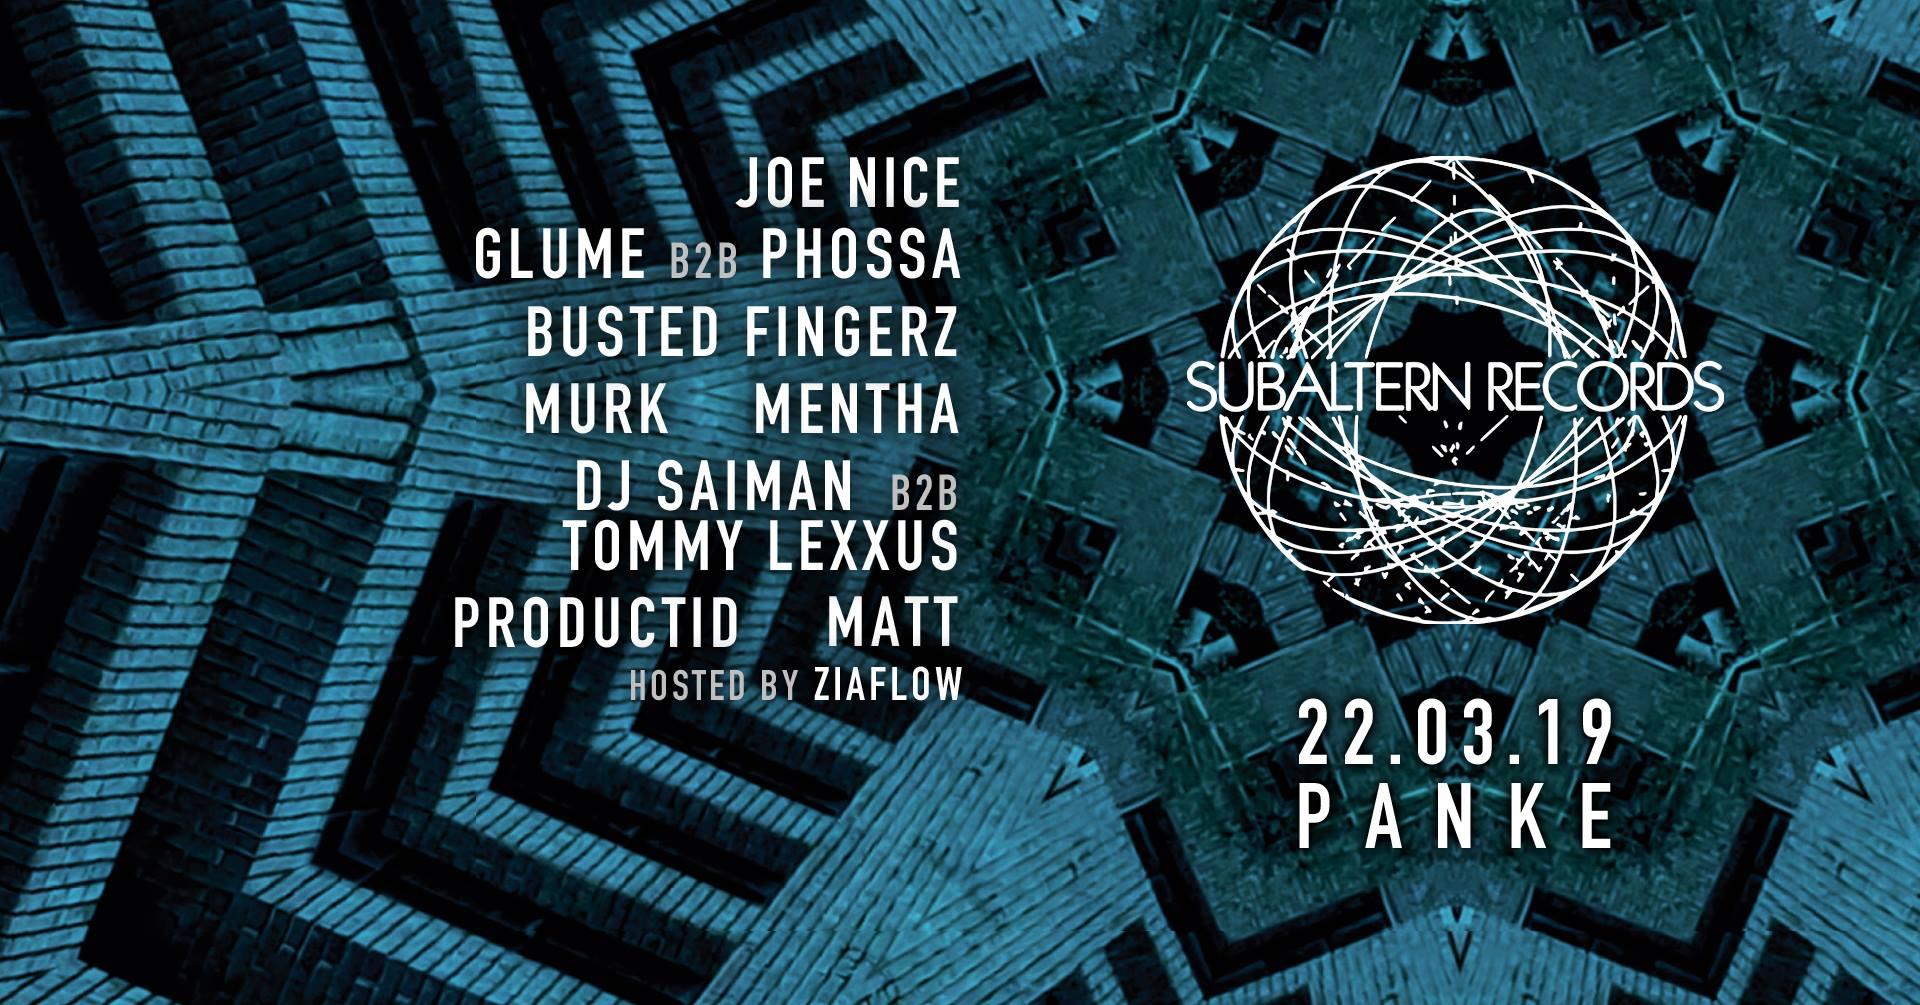 Subaltern Records: Joe Nice, Glume & Phossa + More – Dubstep/140